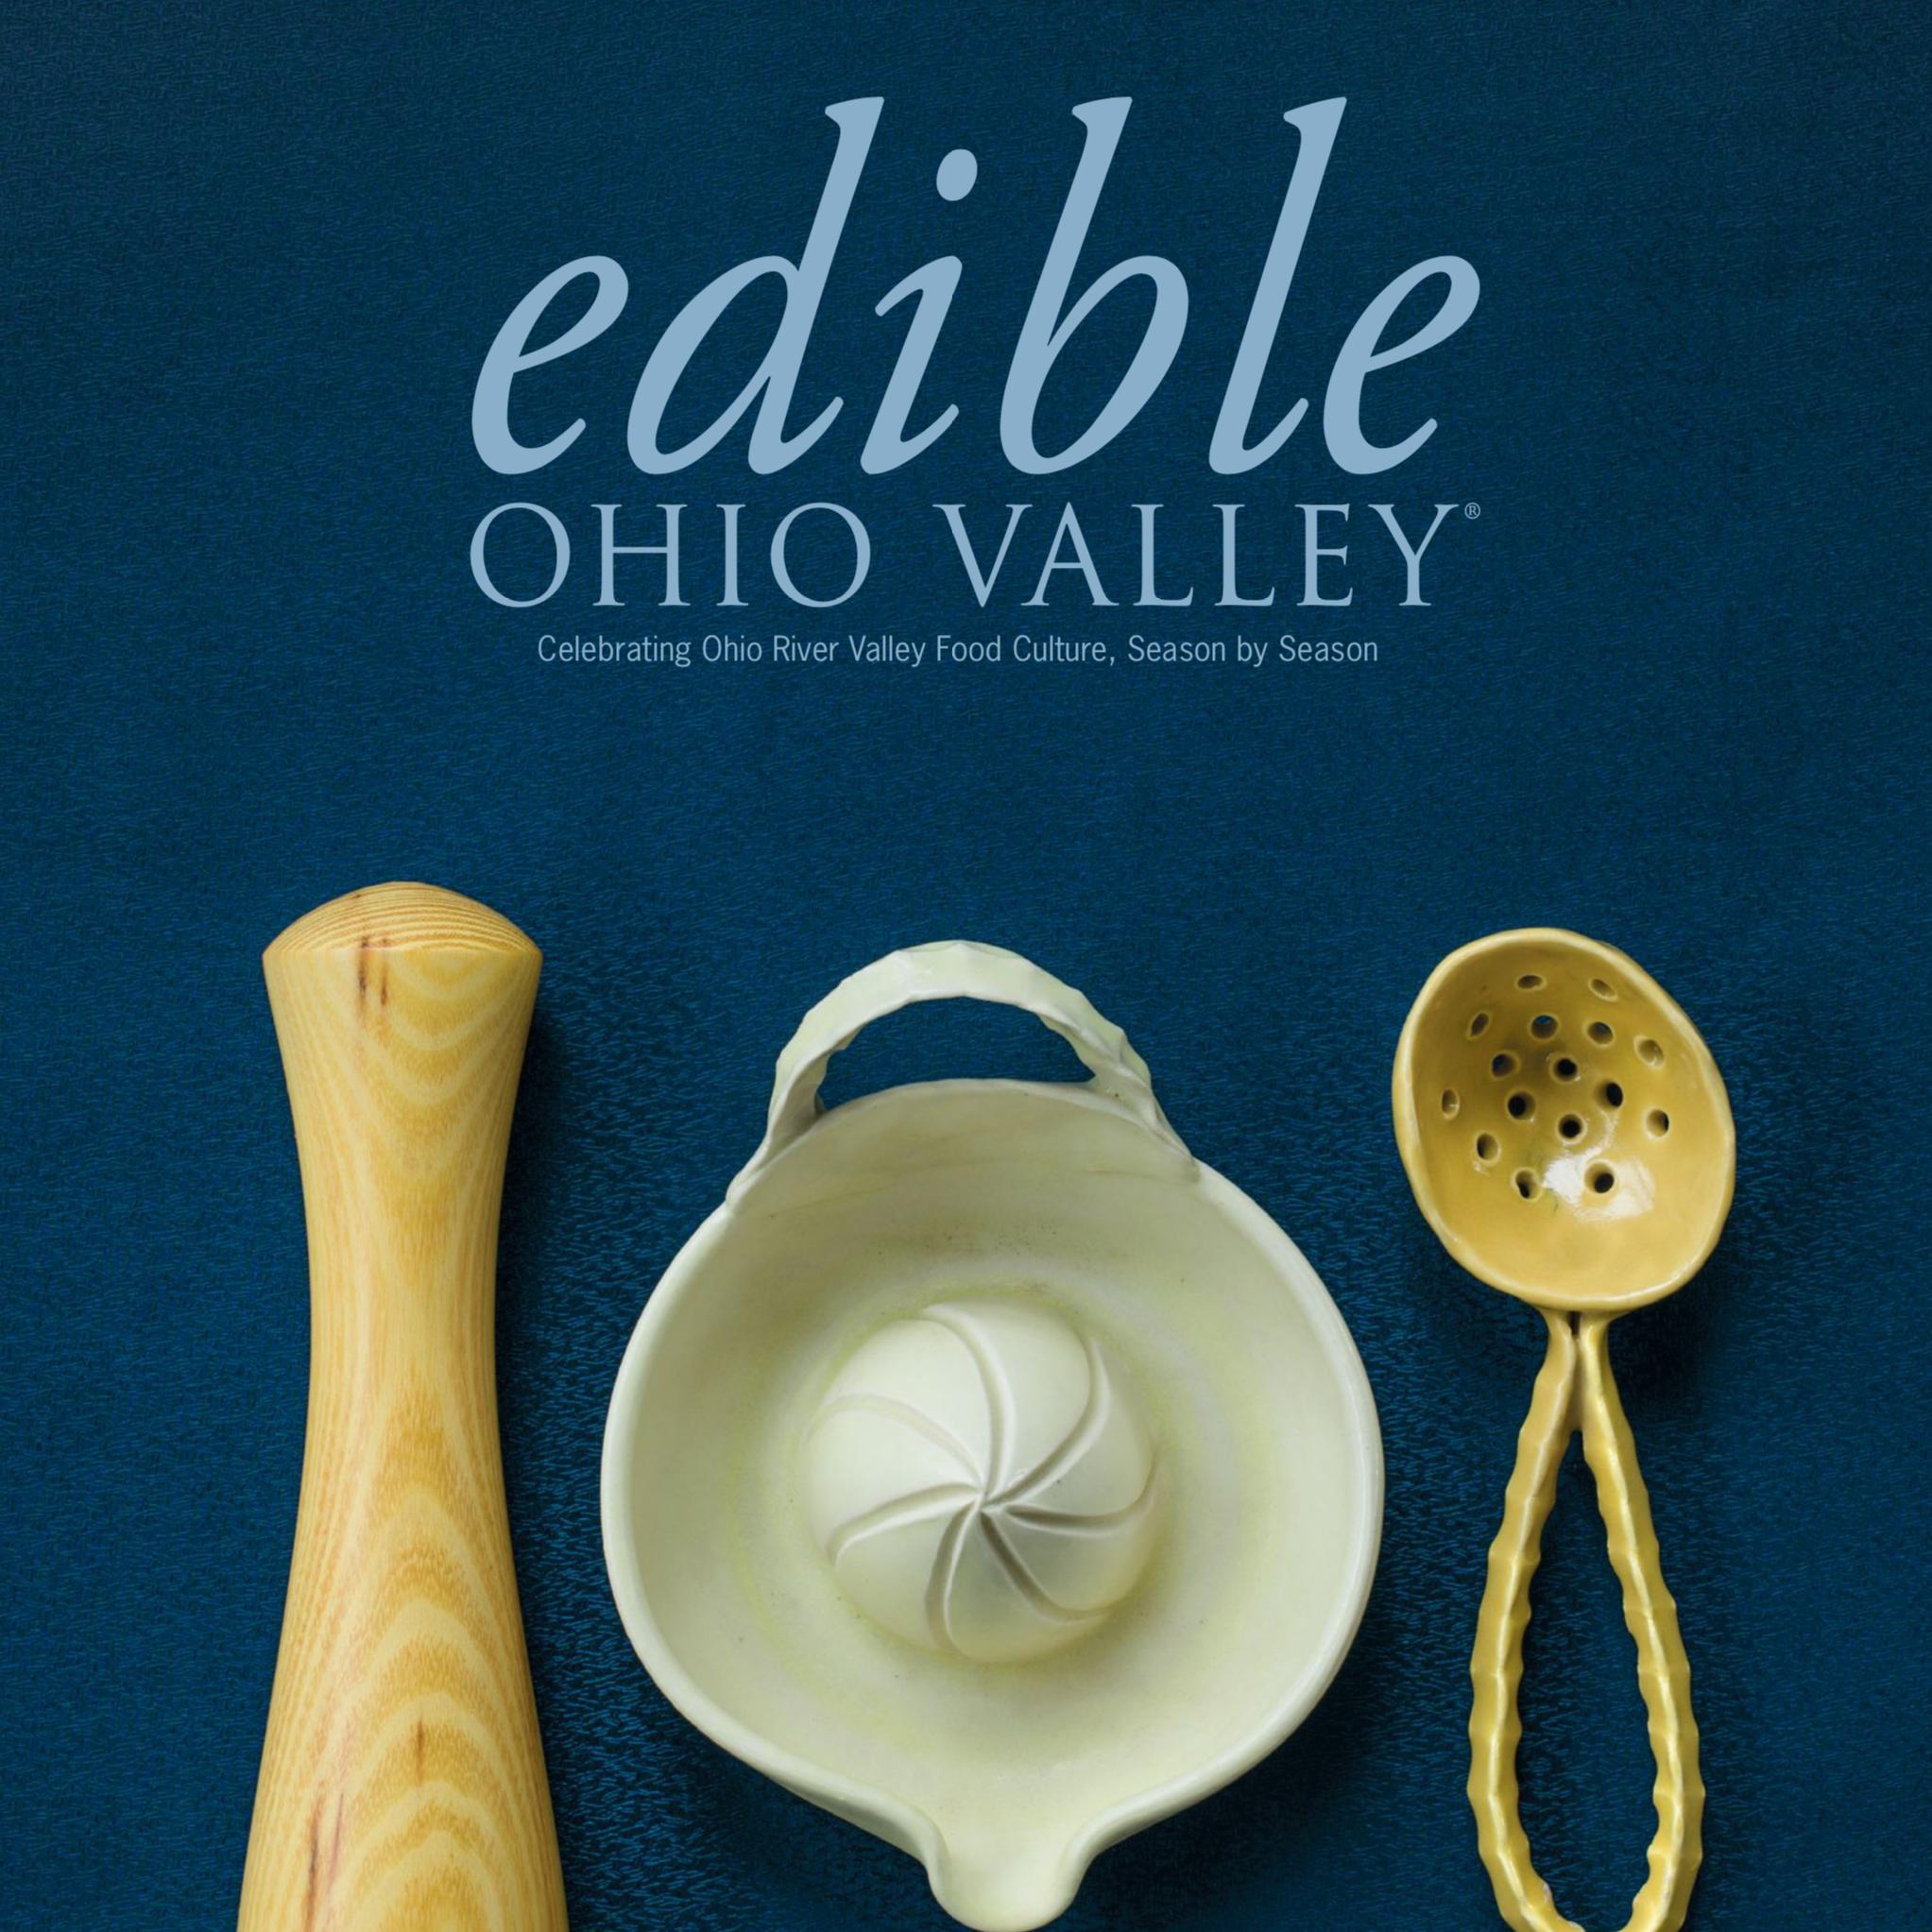 Edible Ohio Valley Gift Guide 2015 – Eat Local, Shop Local - Image via Edible Ohio Valley Magazine • 2015-2016, No. 22